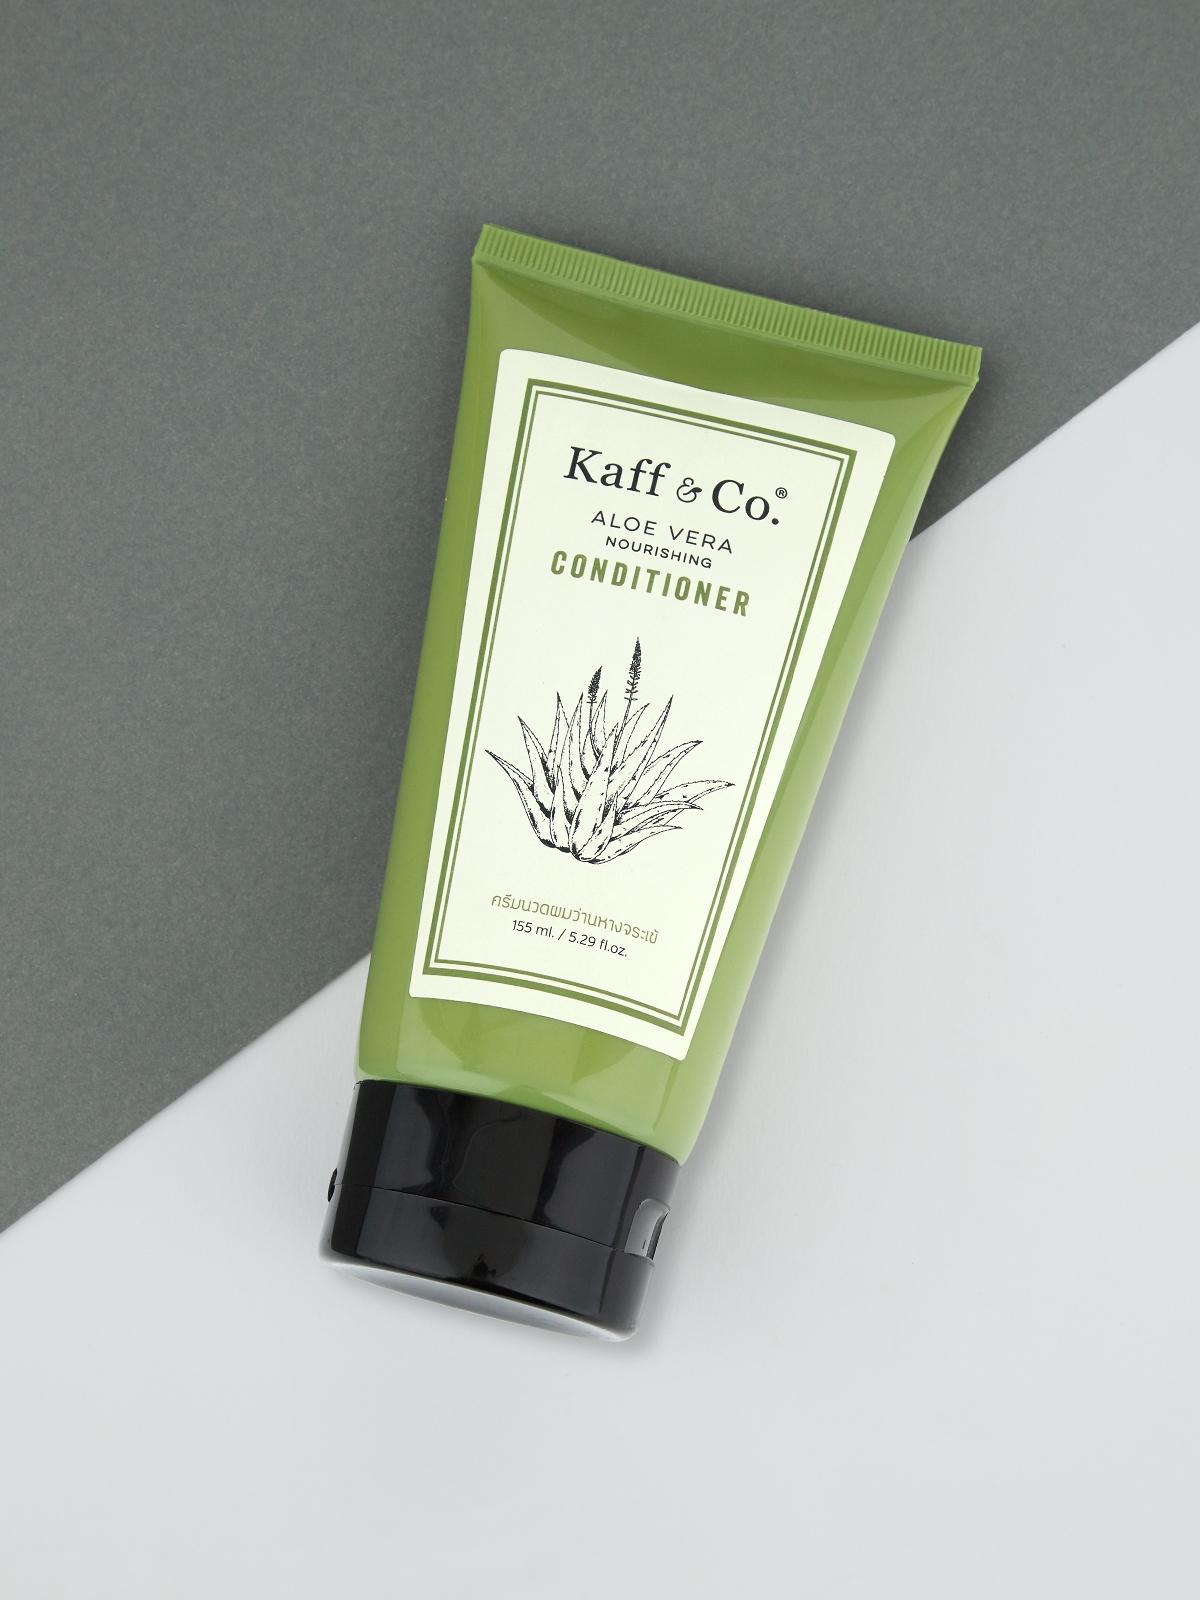 Kaff Co Aloe Vera Nourishing Conditioner 155 ml